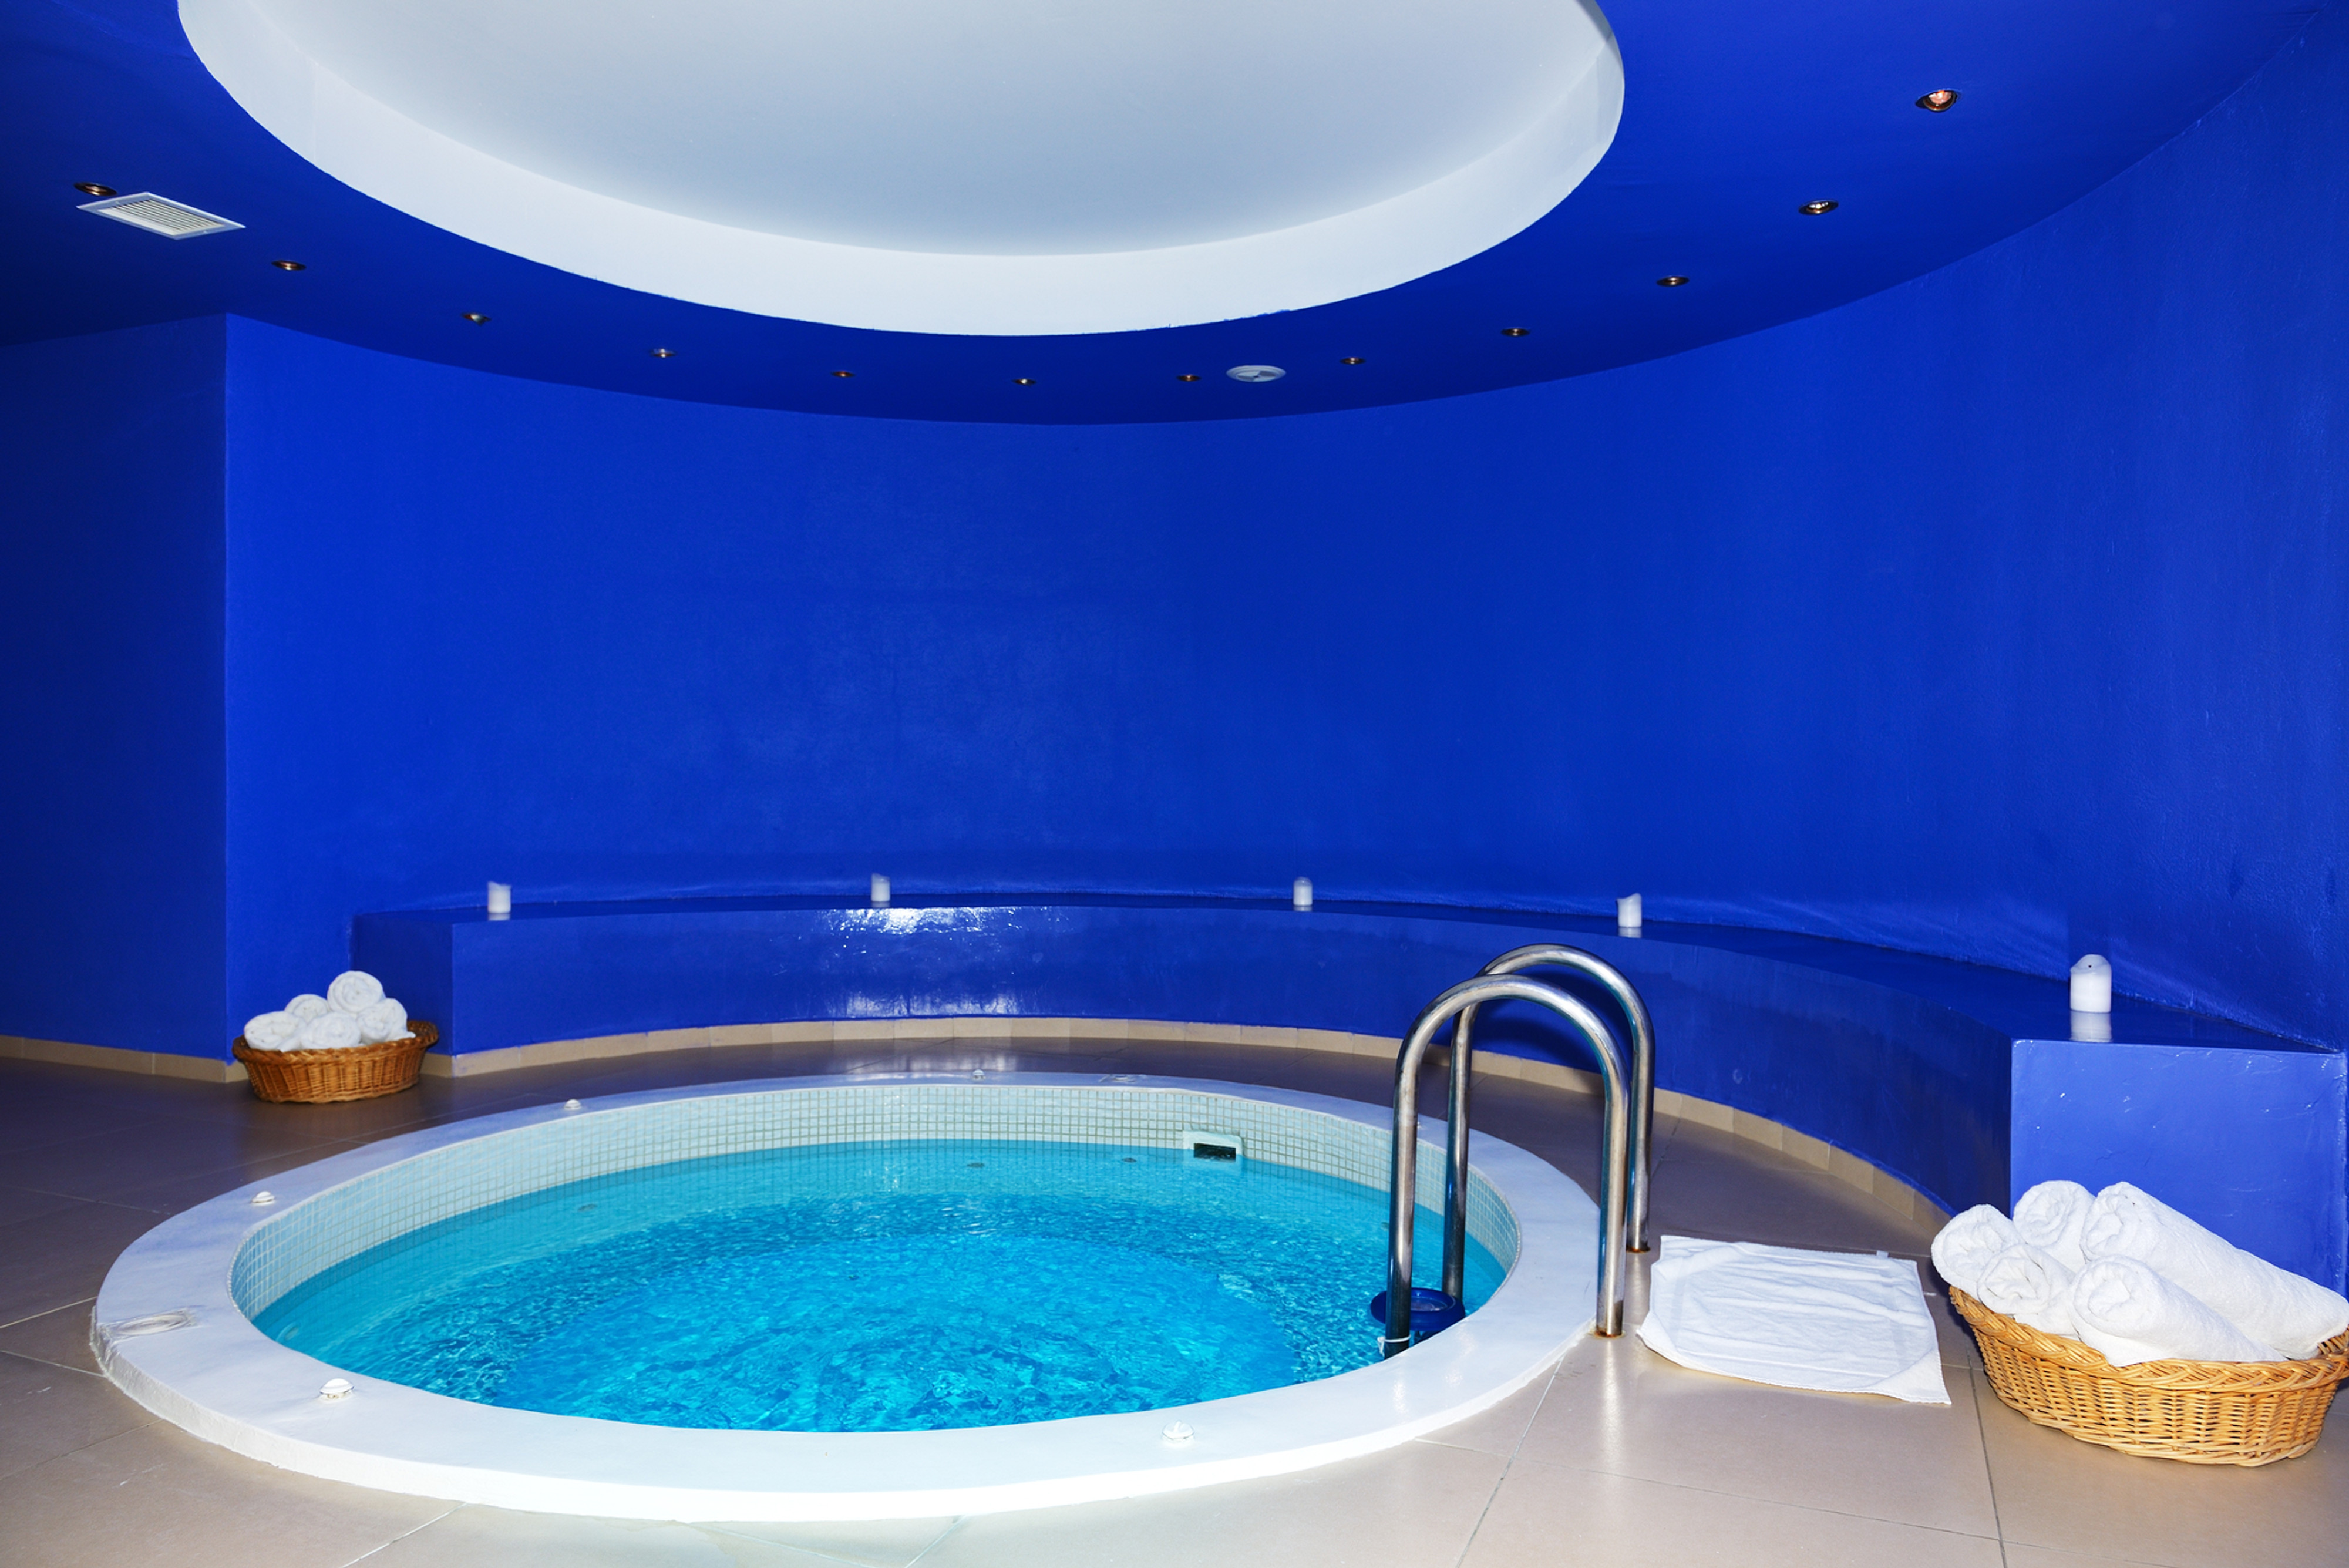 Hot Tub Winterization